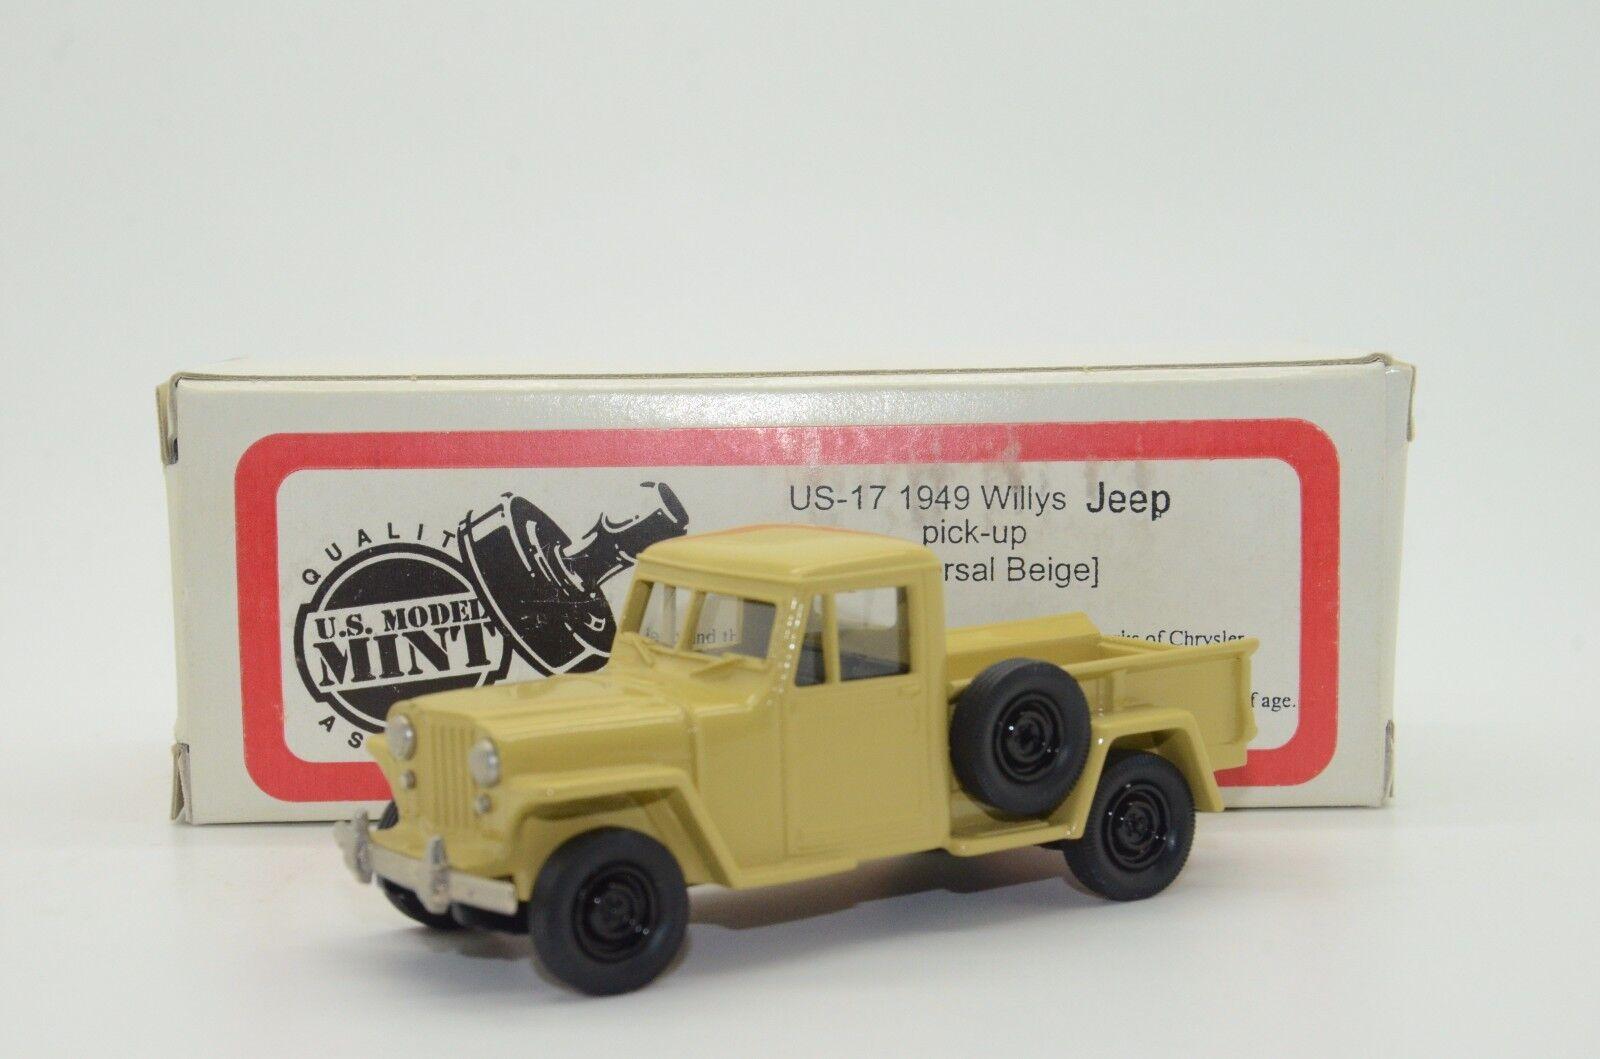 Raro Jeep Willys recoger 1949 nos menta Modelo Brooklin EE. UU. 17 1 43